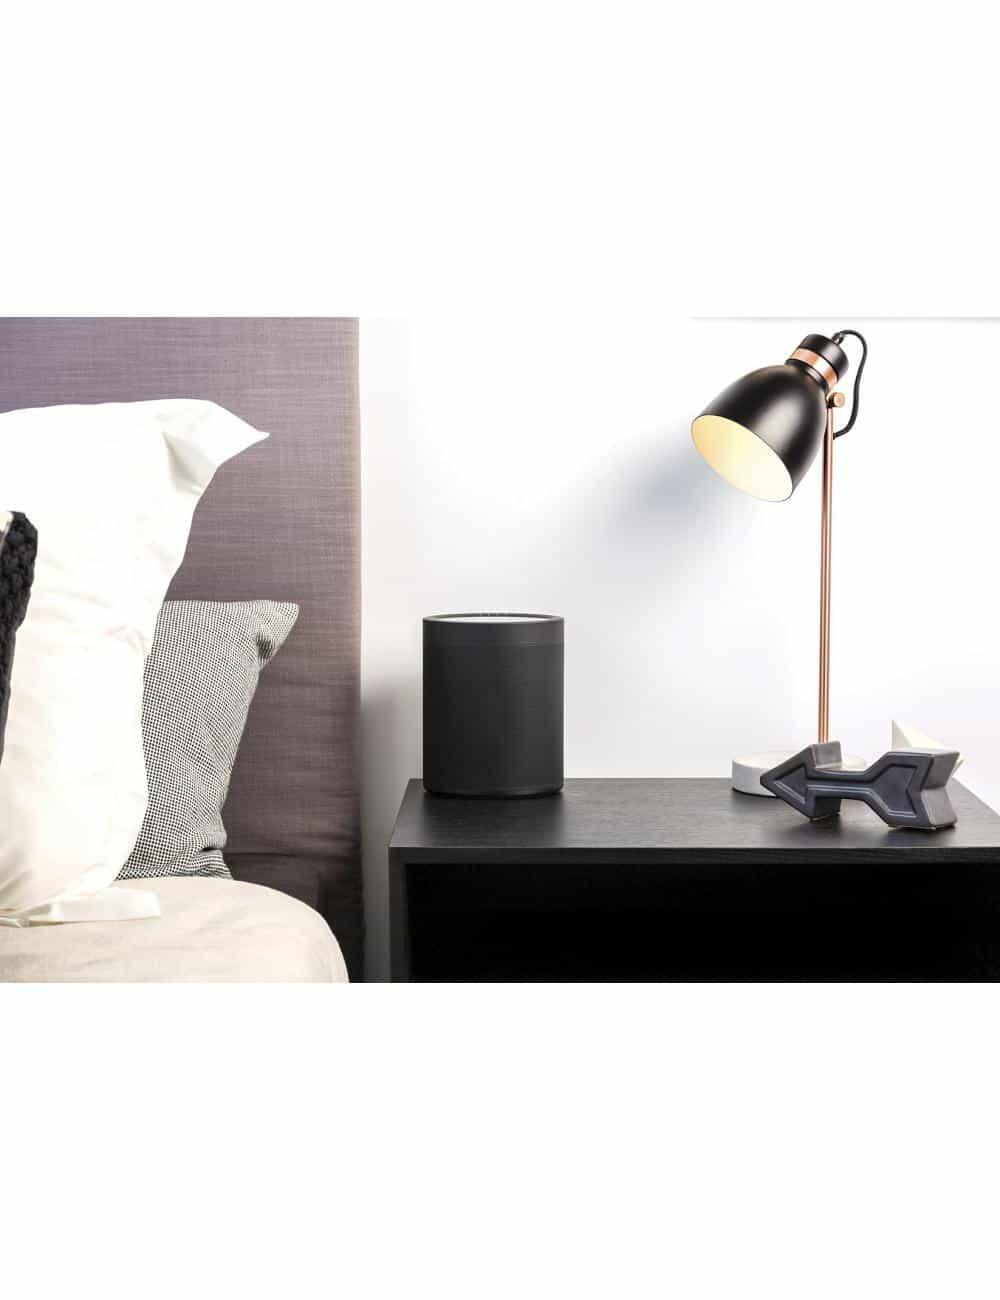 Diffusore amplificato wireless streaming, Yamaha MusicCast 20,  finitura nero, in ambiente